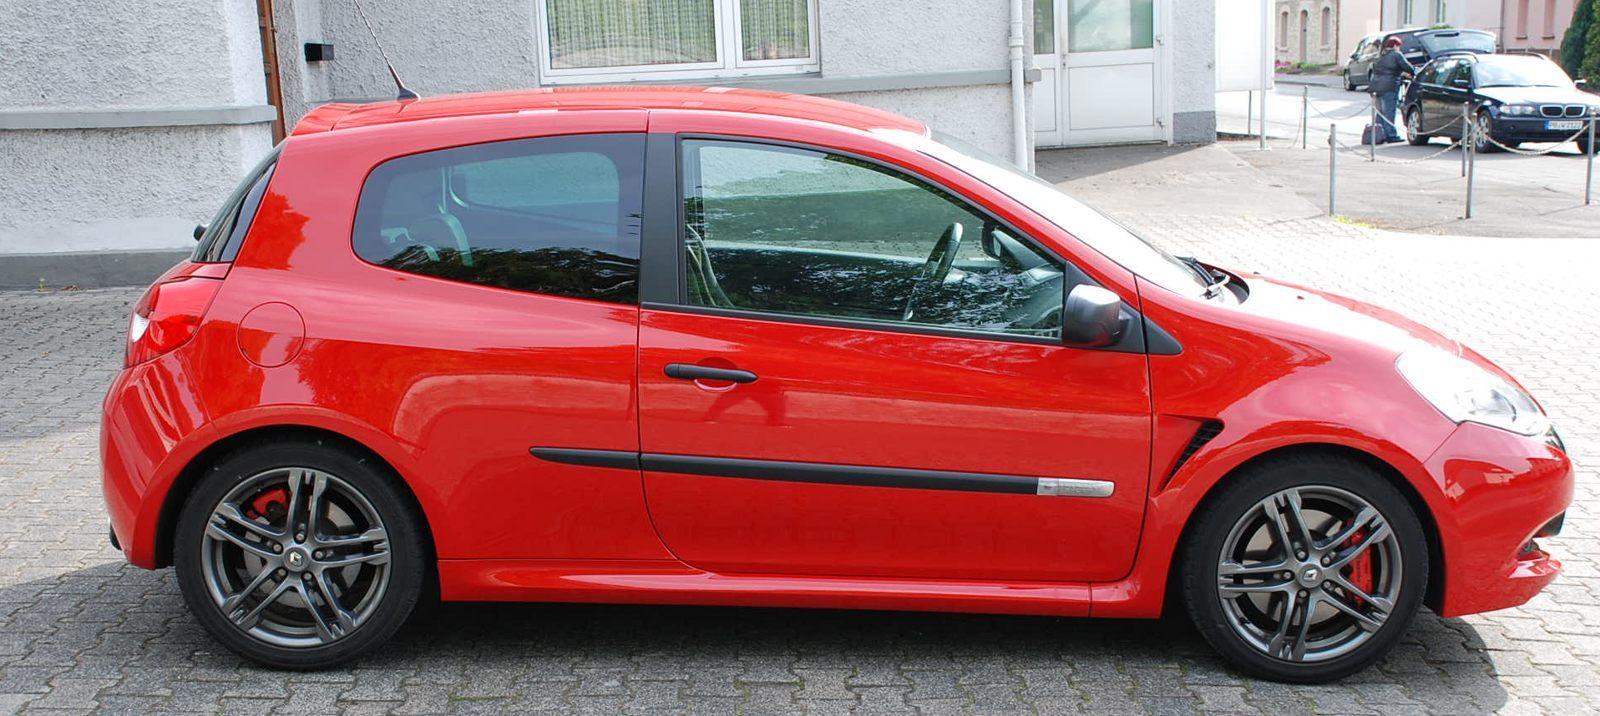 2012 RS200_5